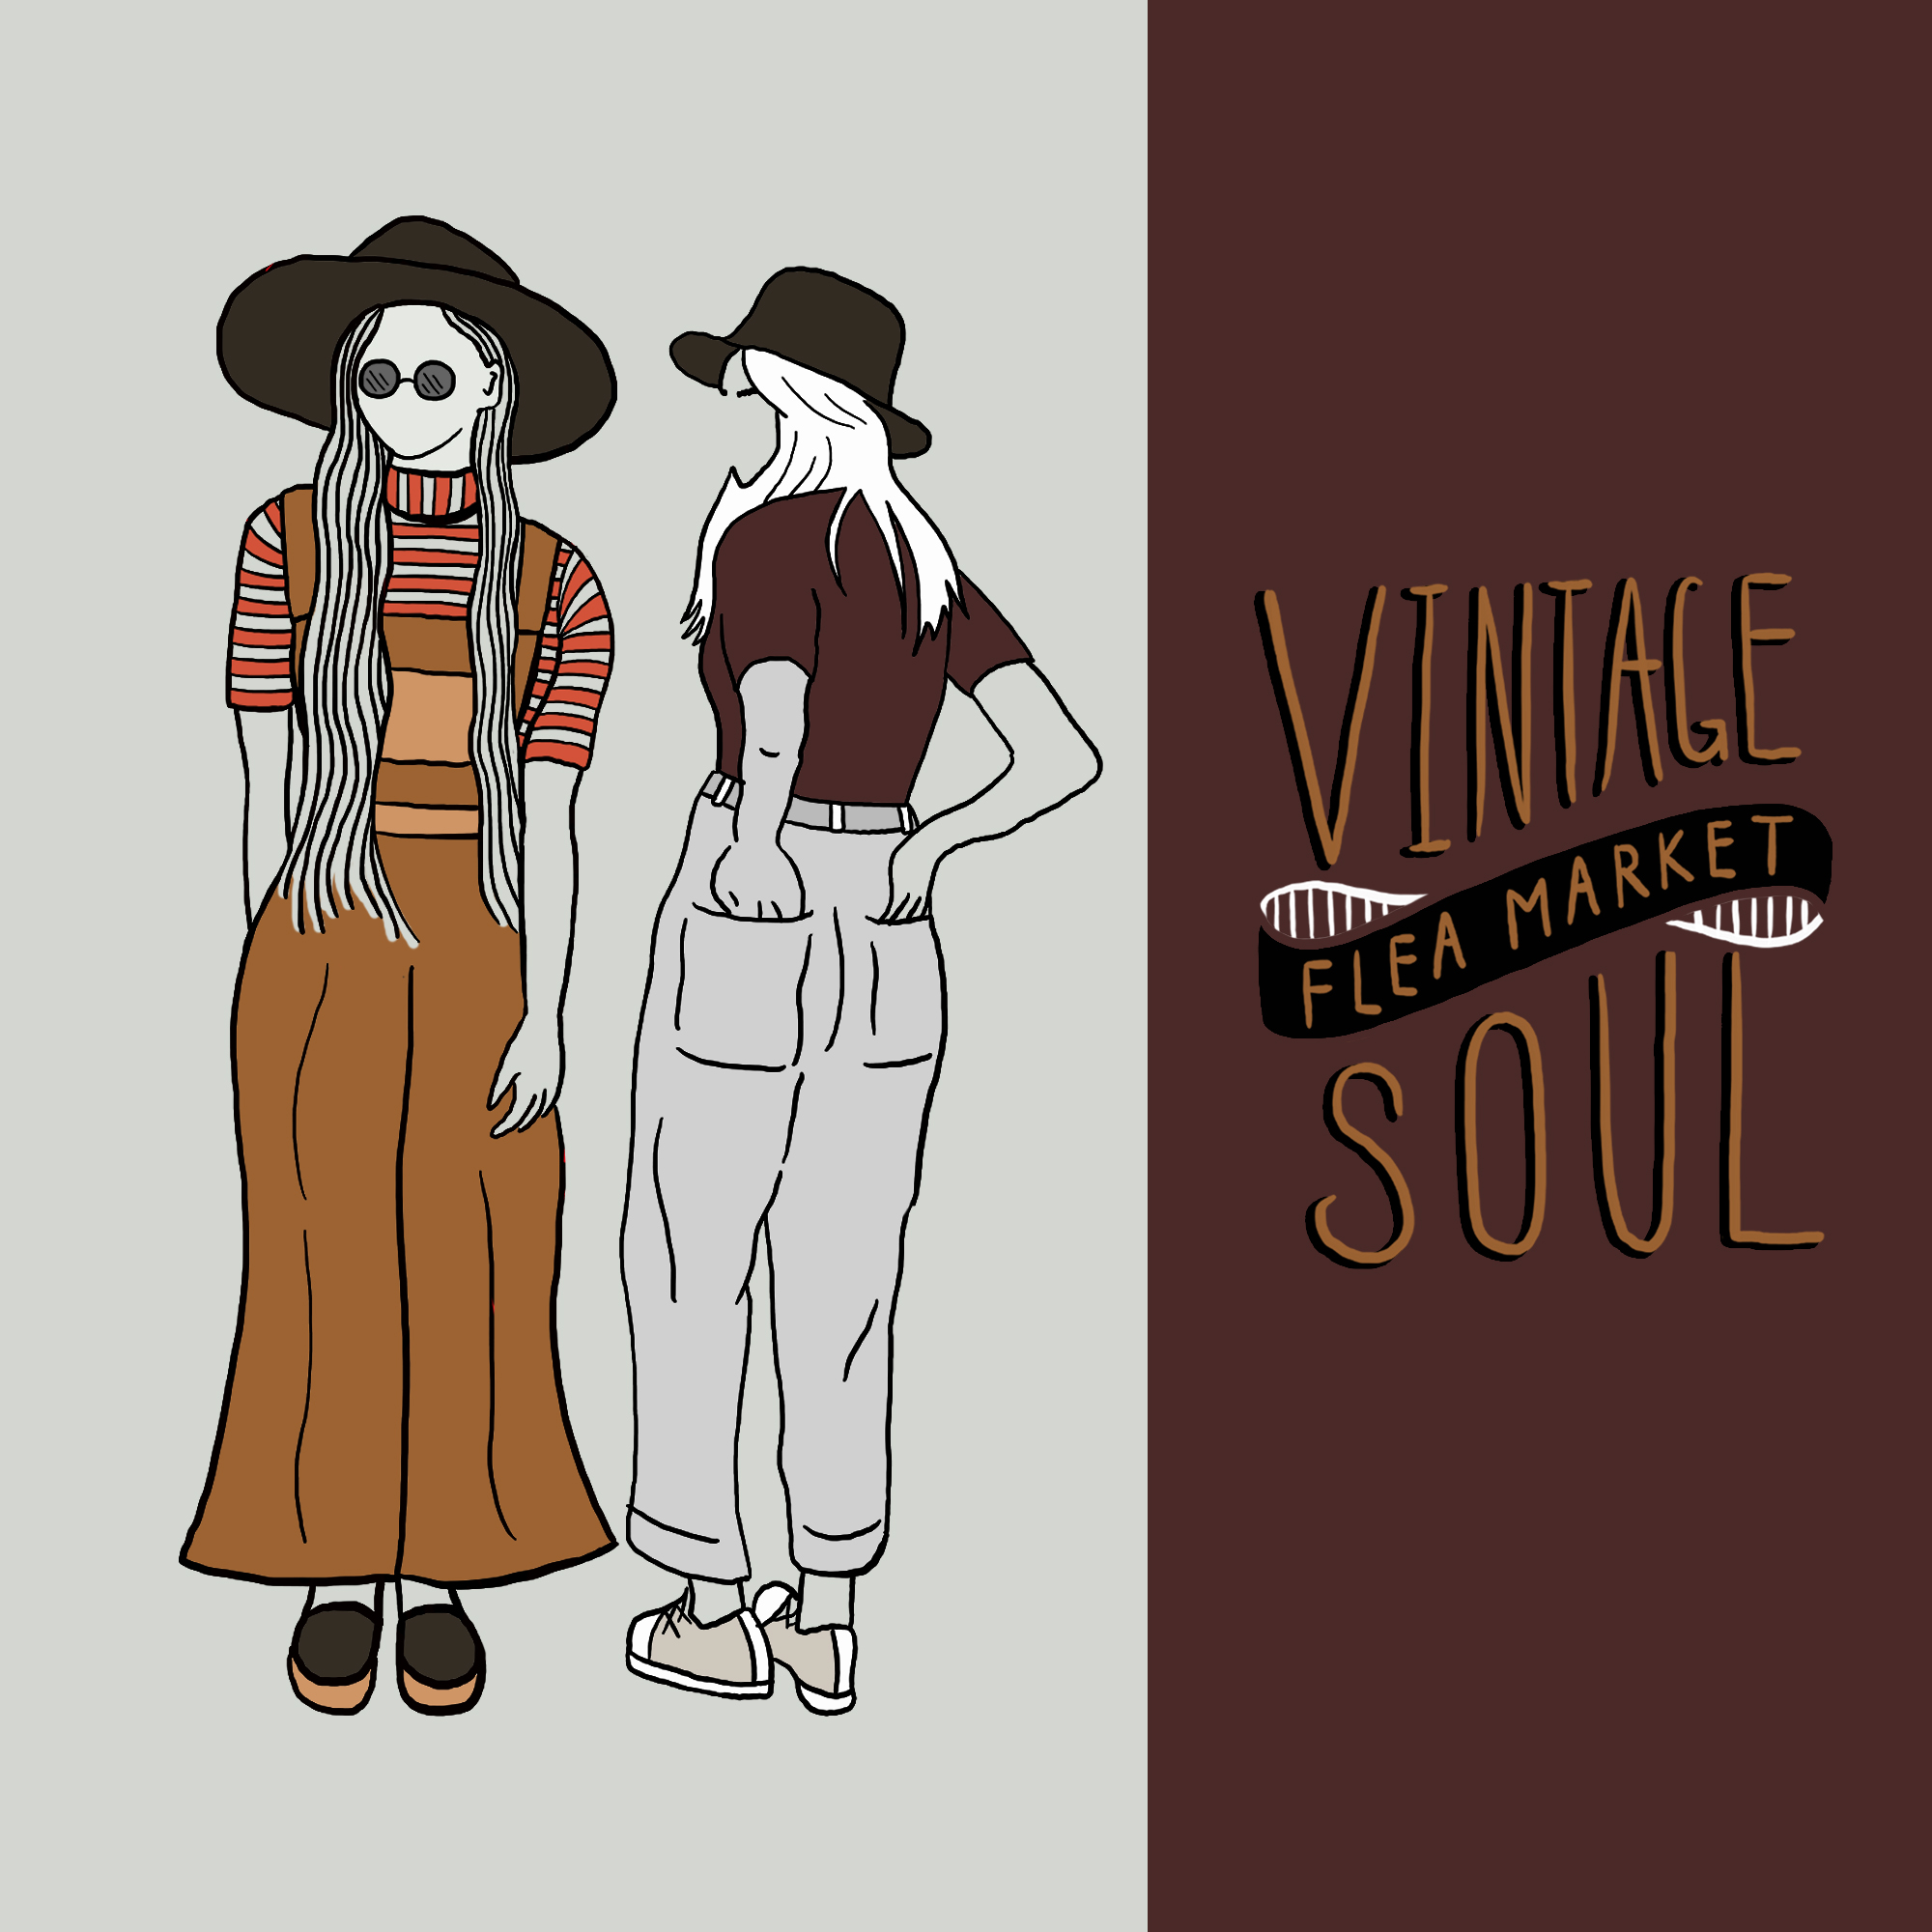 vintagesoulfleamarket-3.jpg